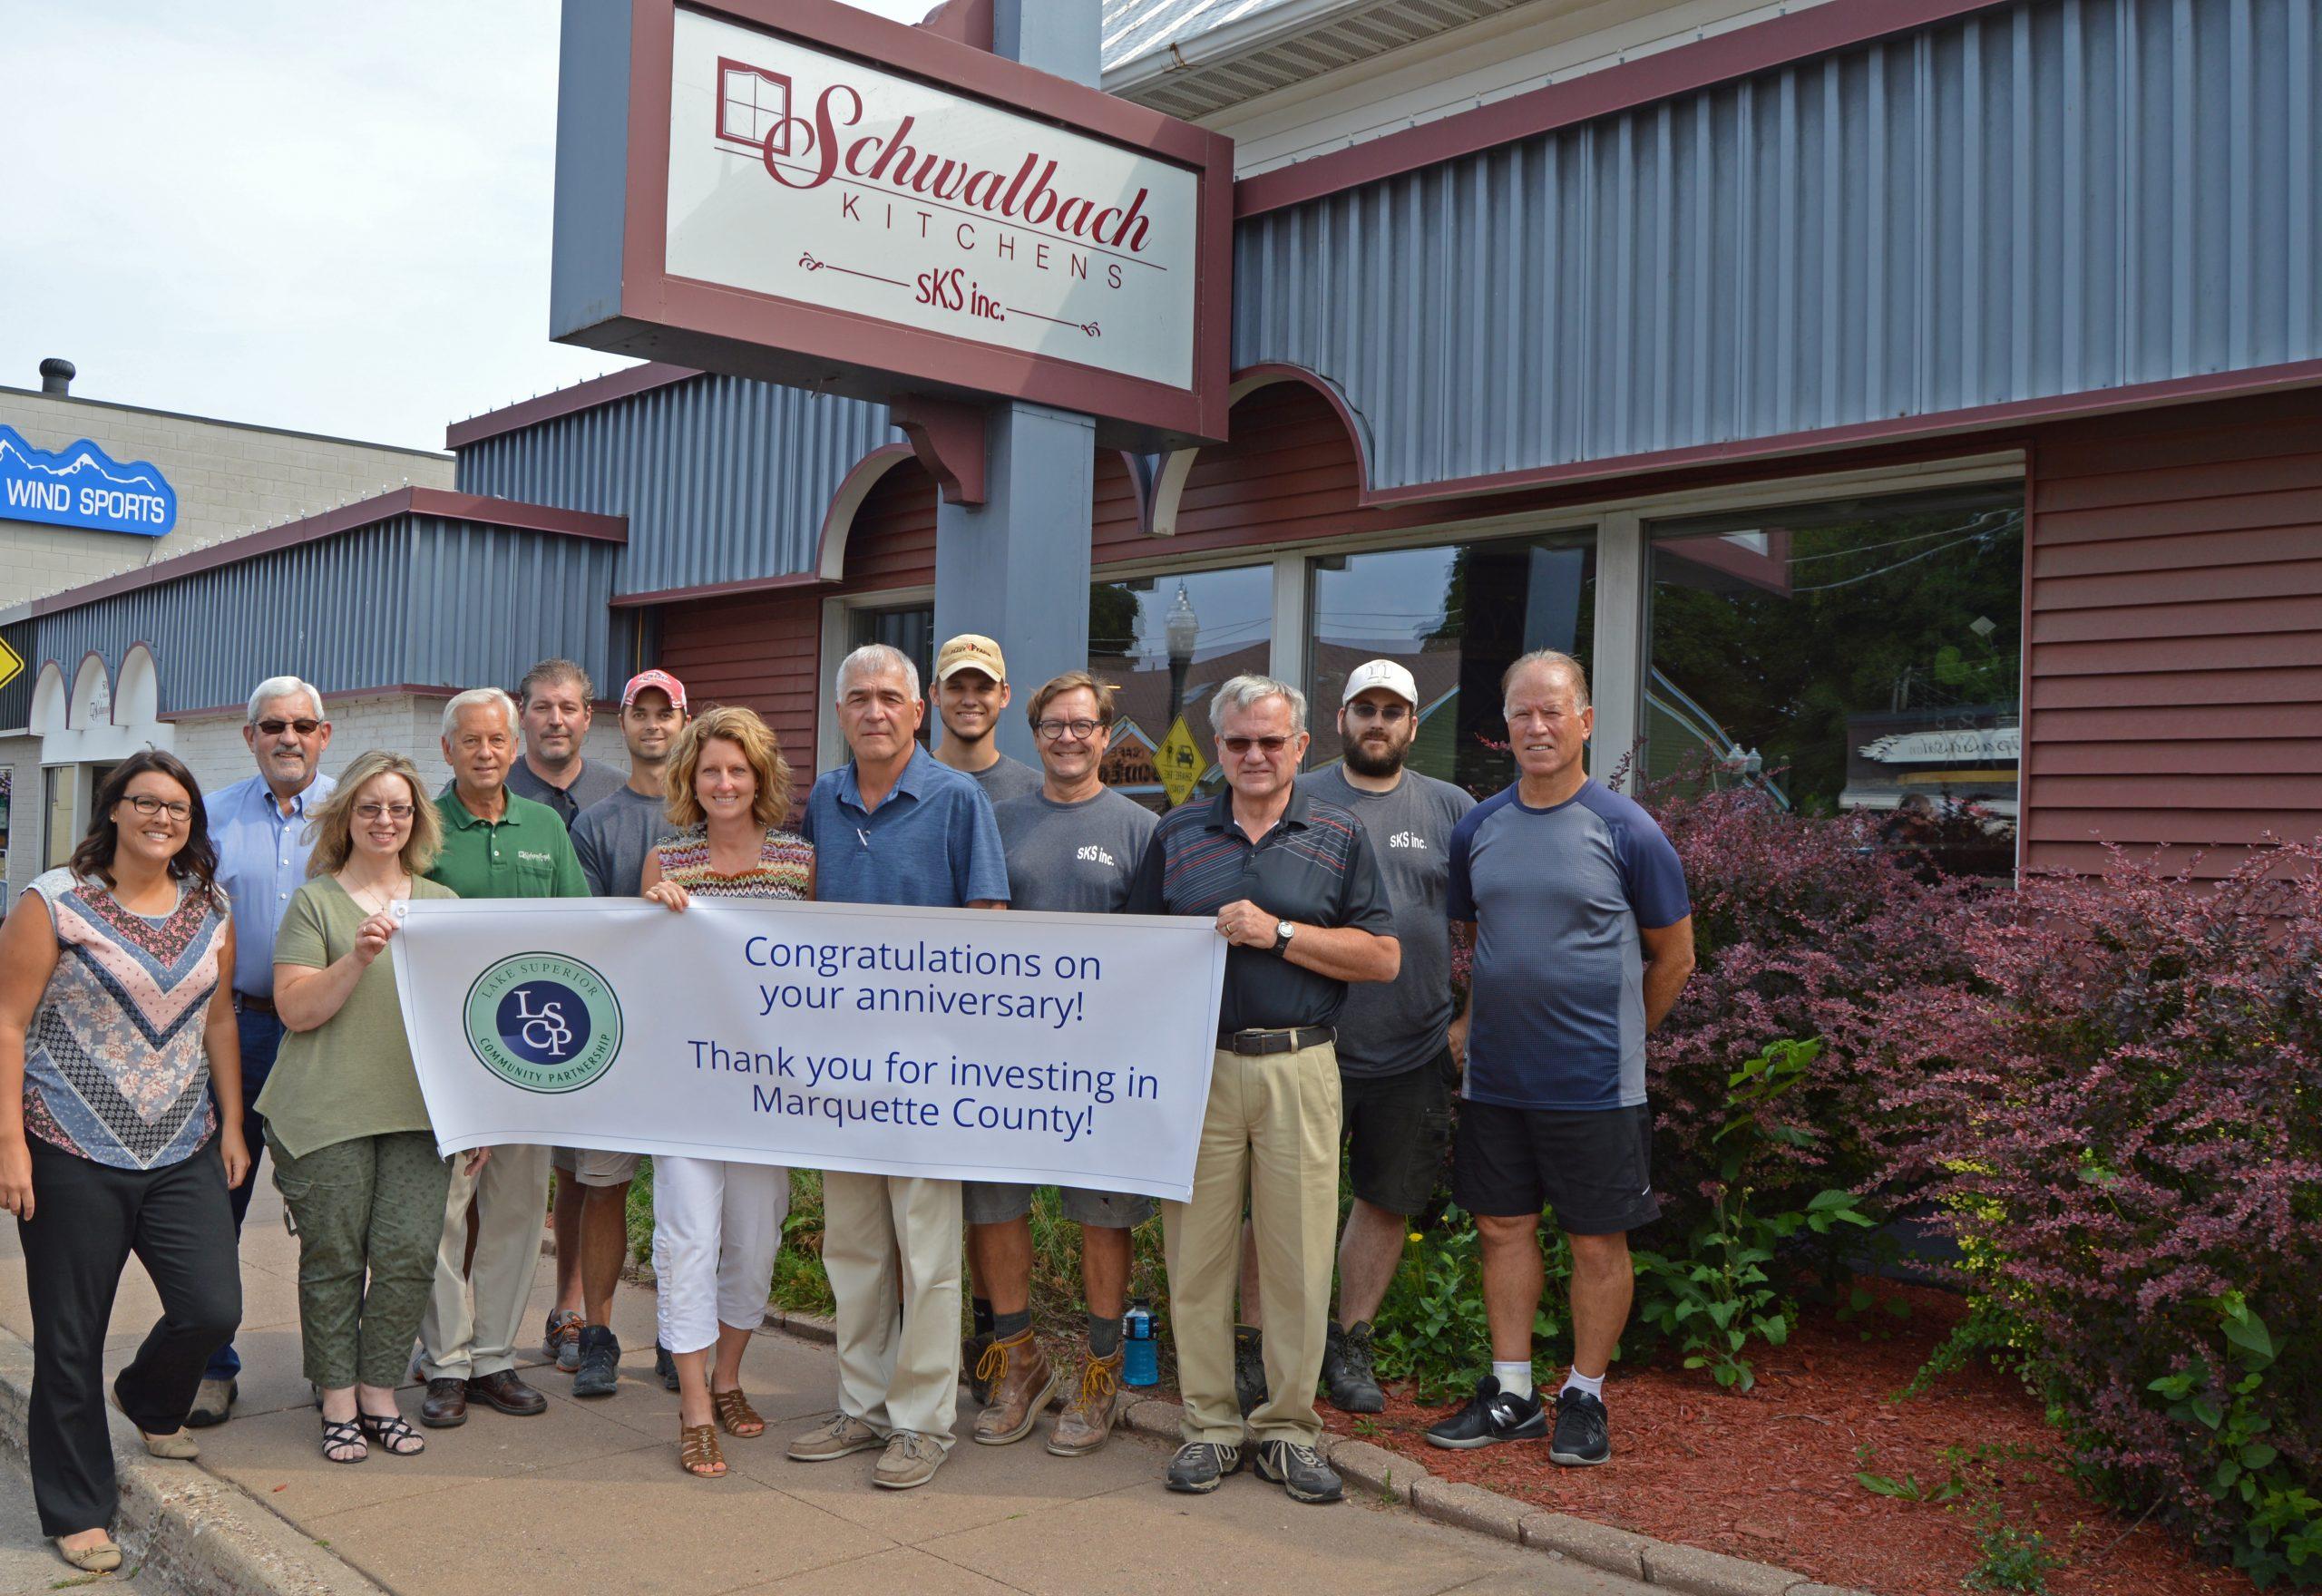 Schwalbach Kitchens Celebrates 40th Anniversary